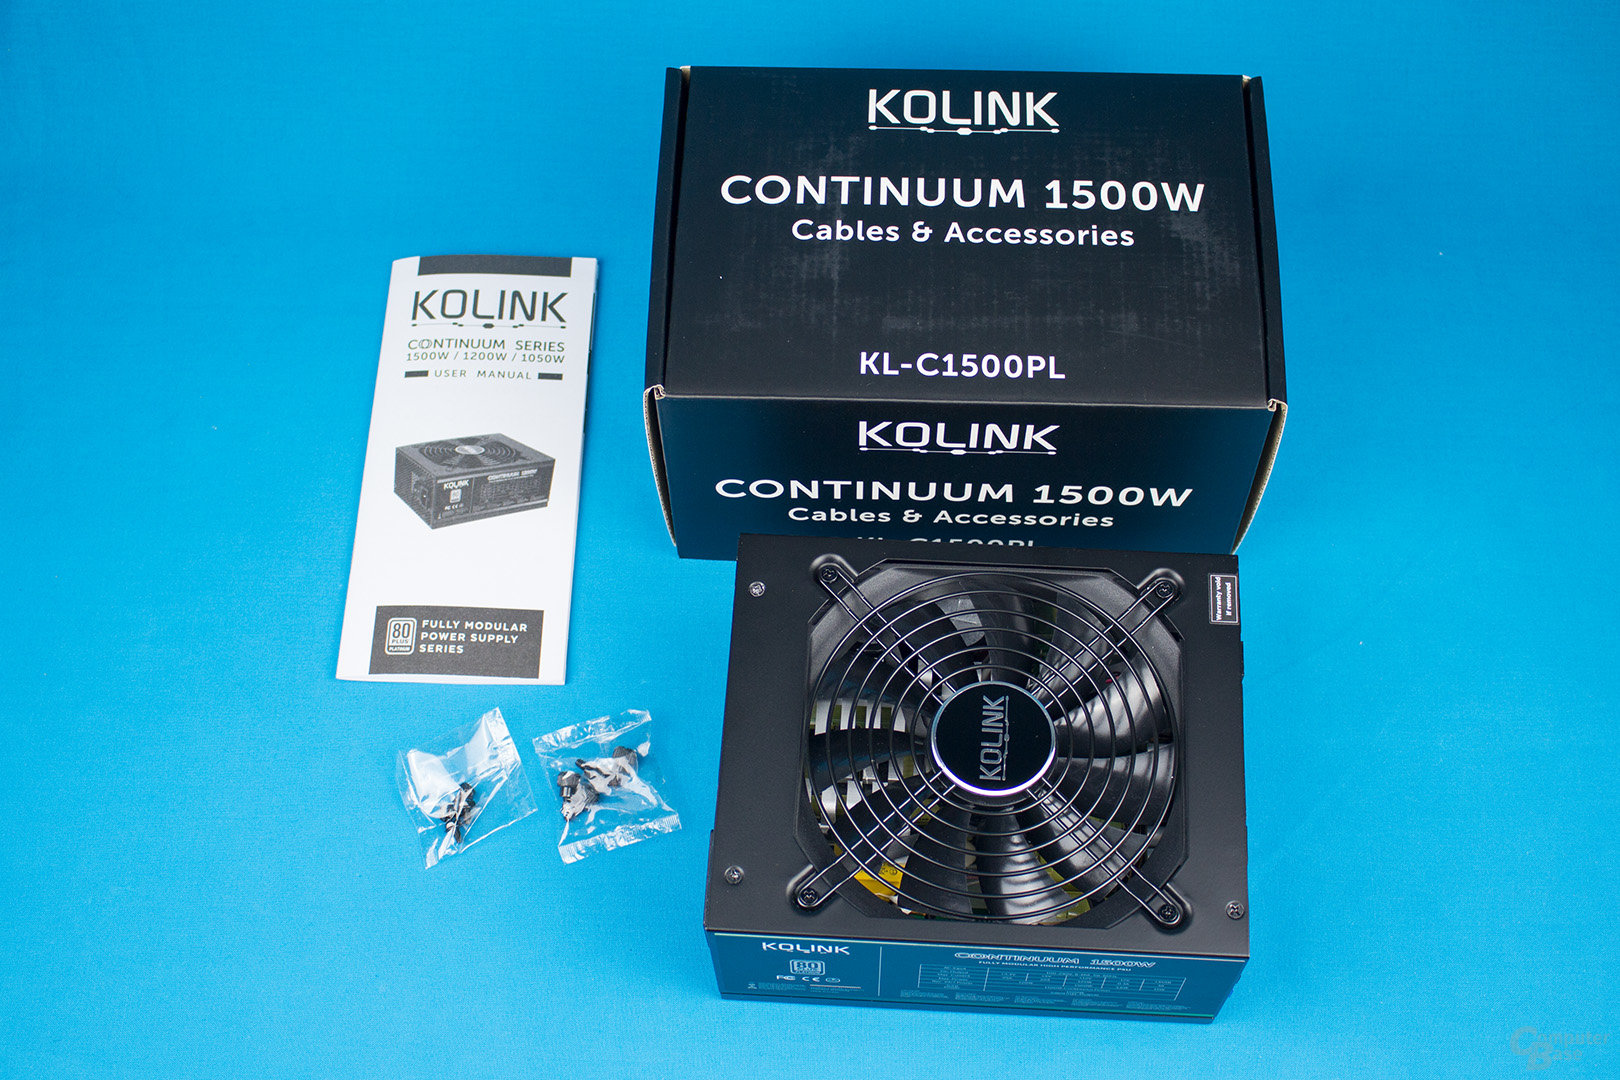 Kolink Continuum 1500W – Lieferumfang